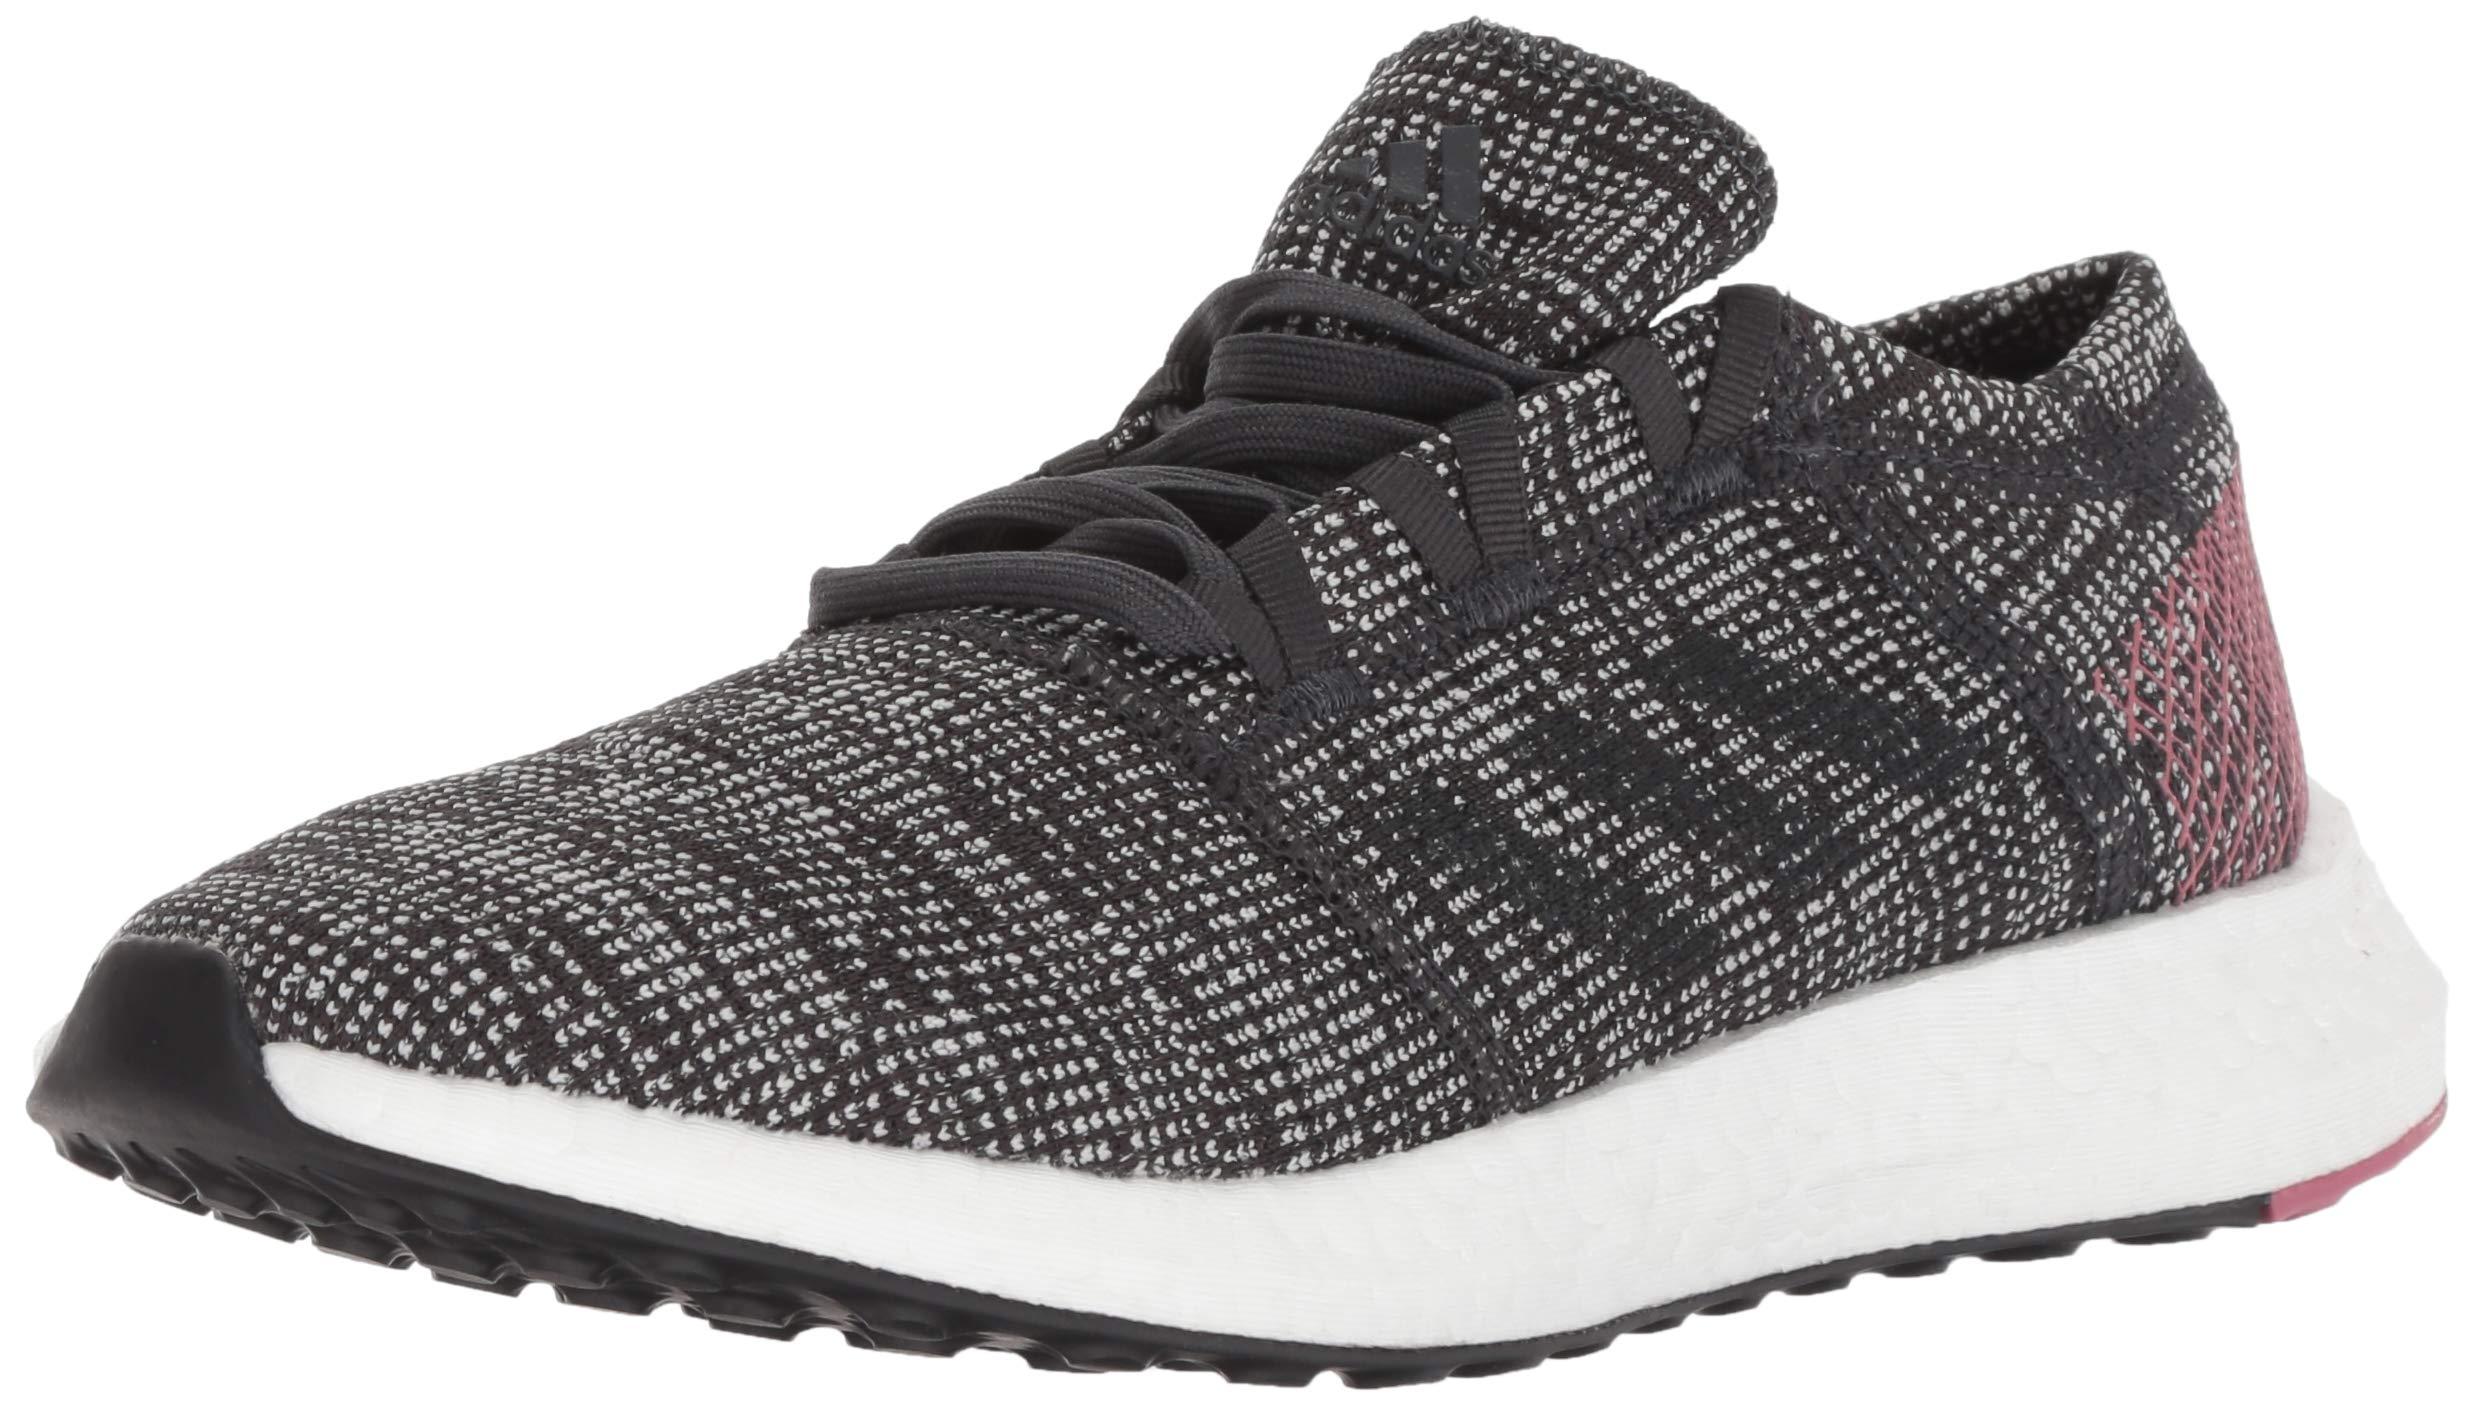 adidas Women's Pureboost Go Running Shoe, Carbon/Trace Maroon, 5 M US